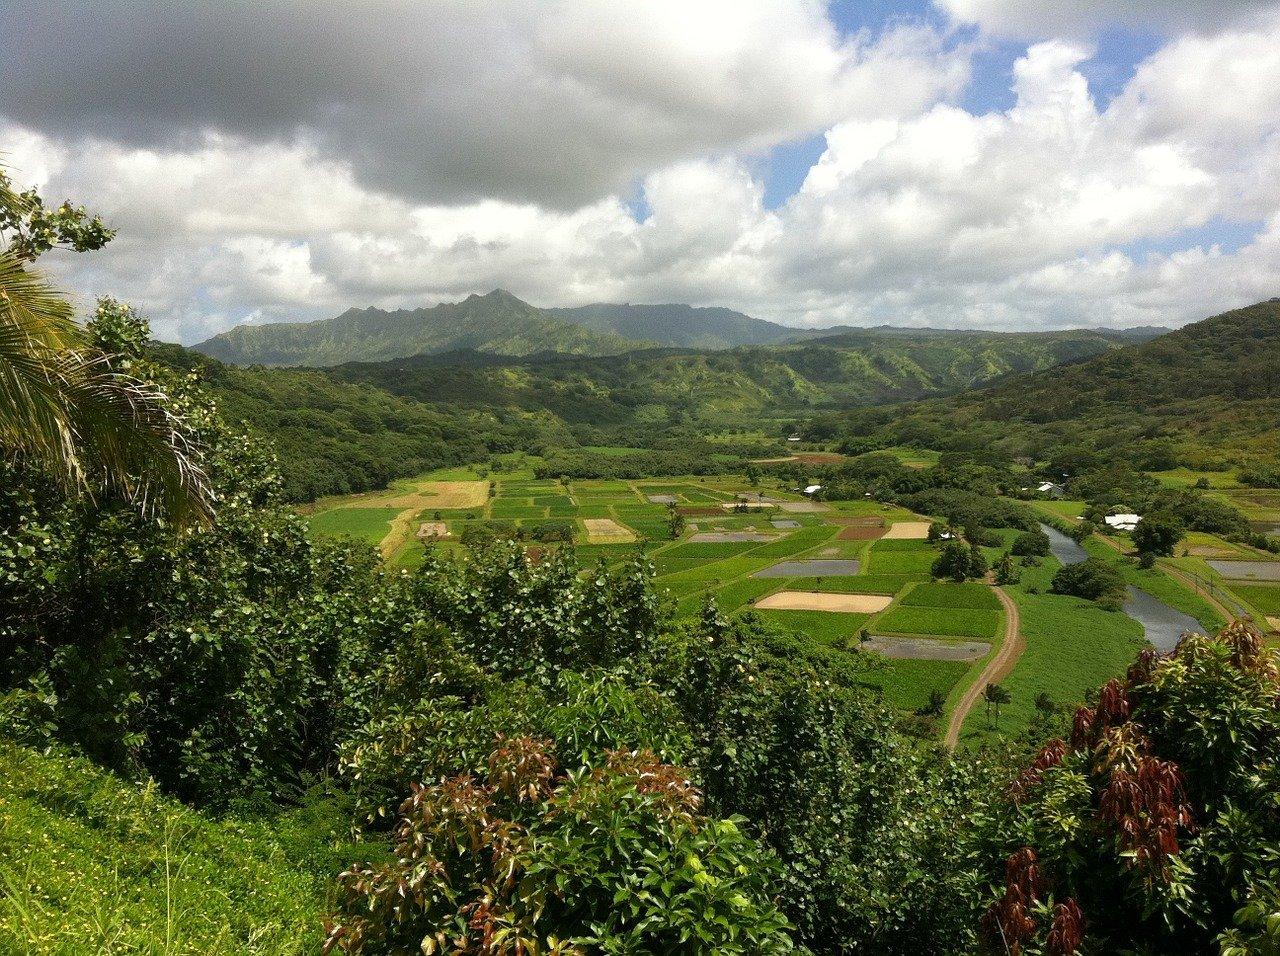 Greenwell Farms - Best Coffee Farm in Hawaii